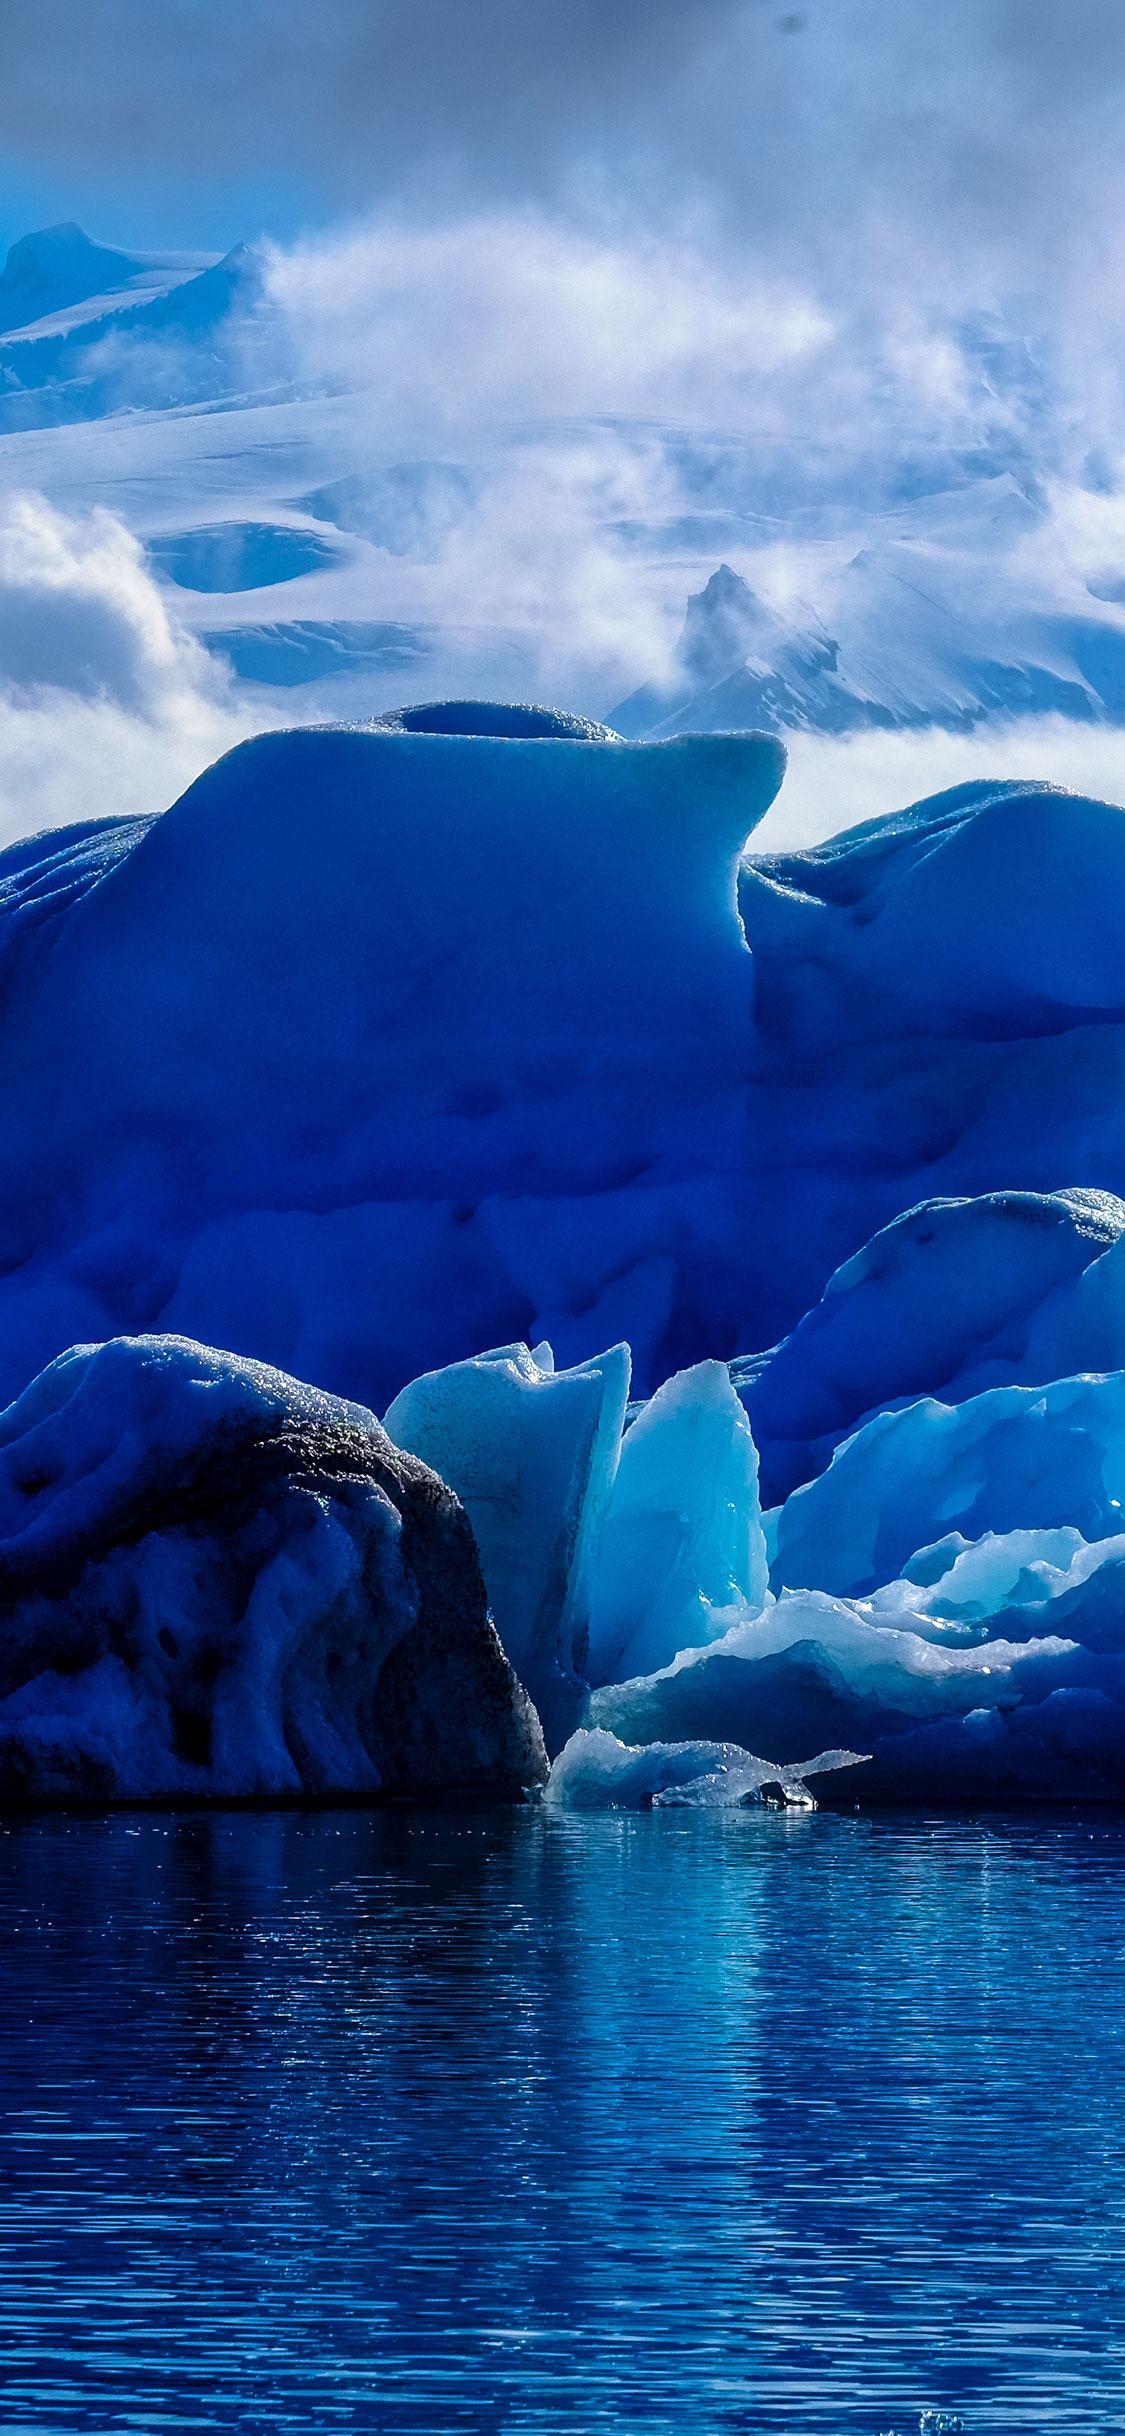 iPhone wallpaper iceberg blue Iceberg